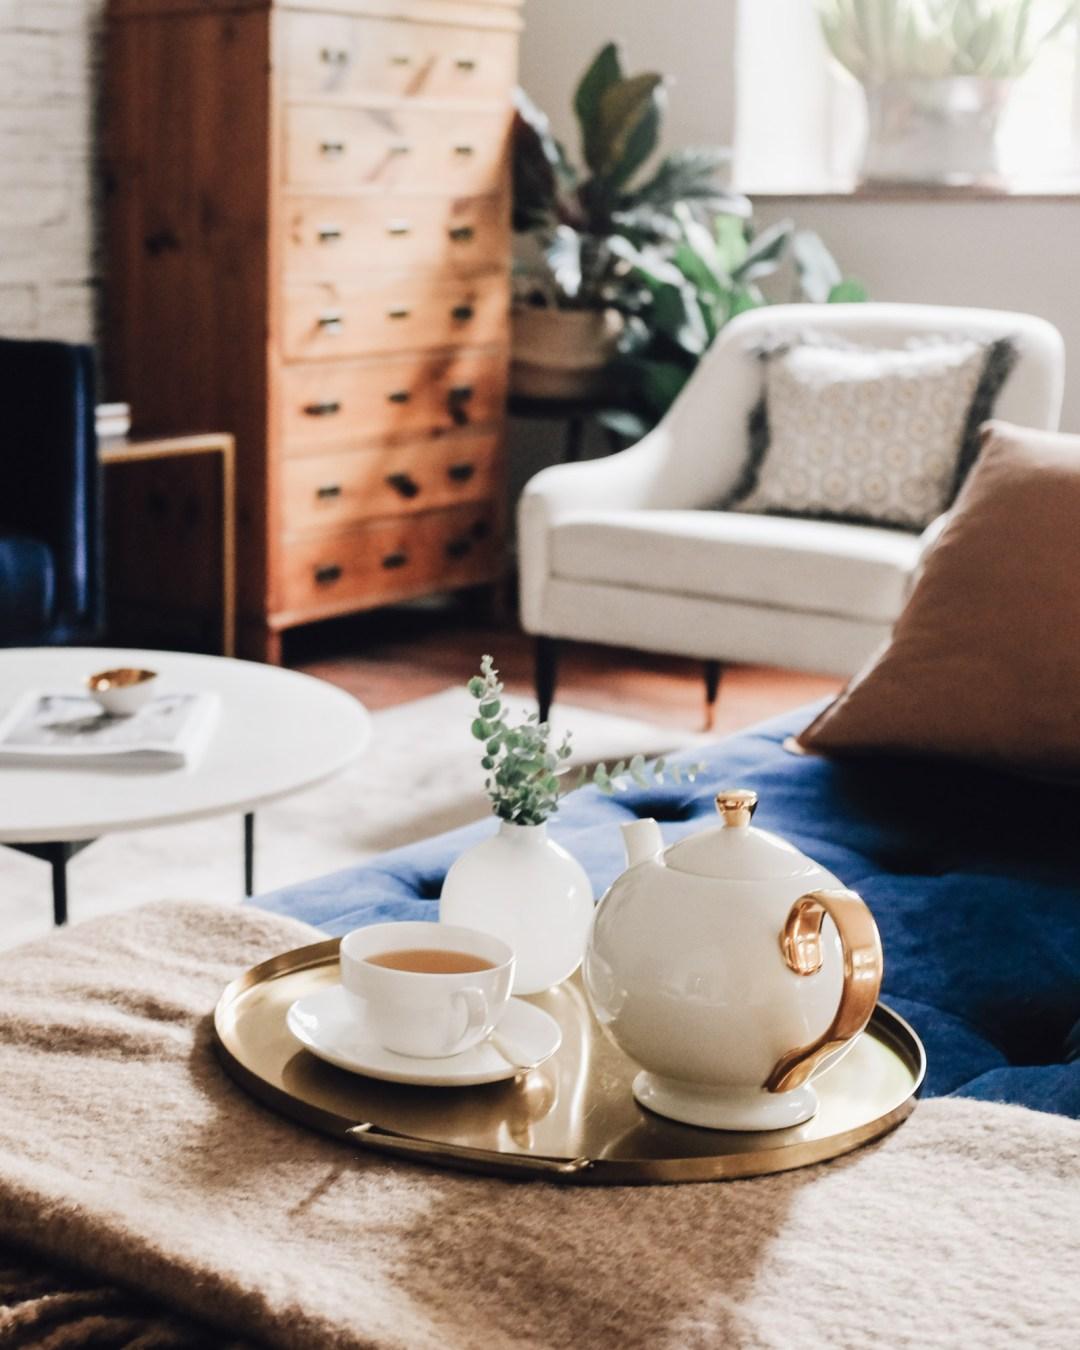 Inastil, Wohnzimmer, Renovierung, Sofa, Sofacompany, Interiors, Livingathome, myhome, Livingroom, Scandistyle, Interiordesign, Solebenwir-14